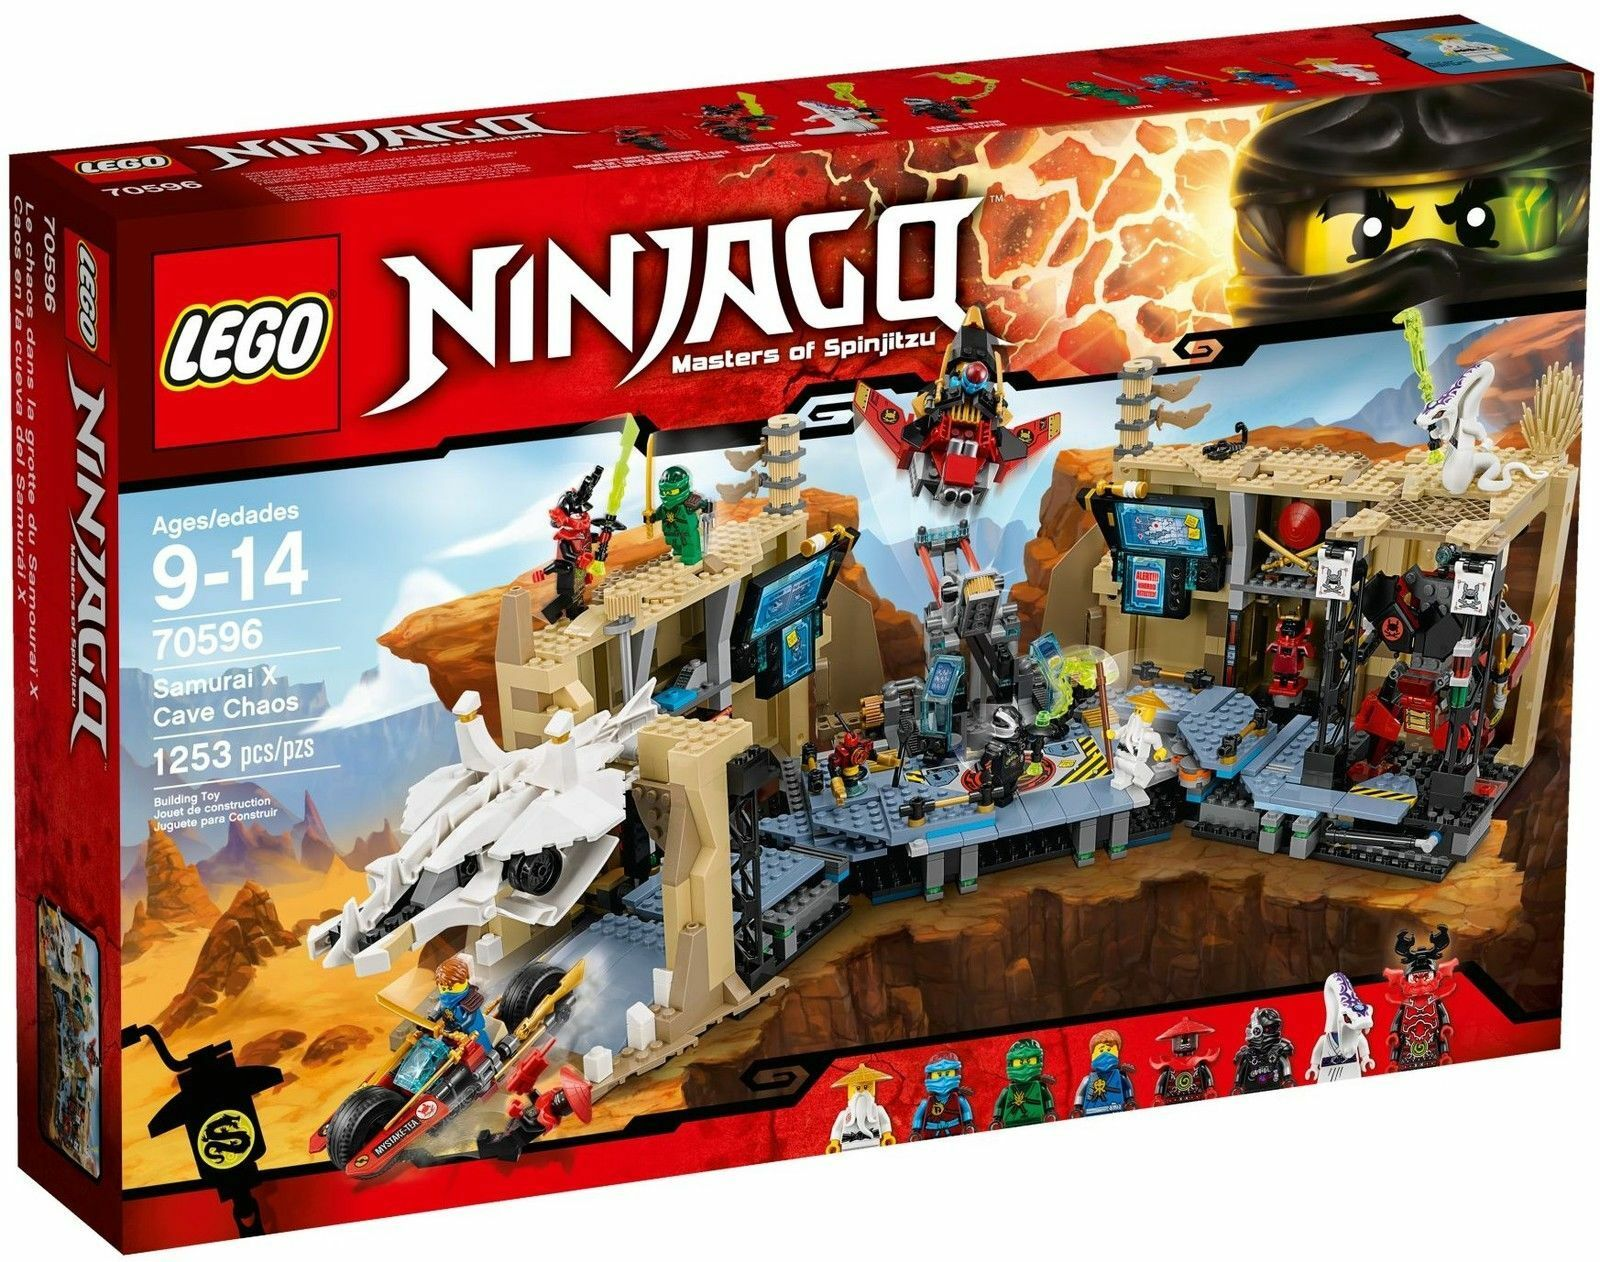 Lego Ninjago 70596 Samurai X Höhlenchaos Günstig Kaufen Ebay